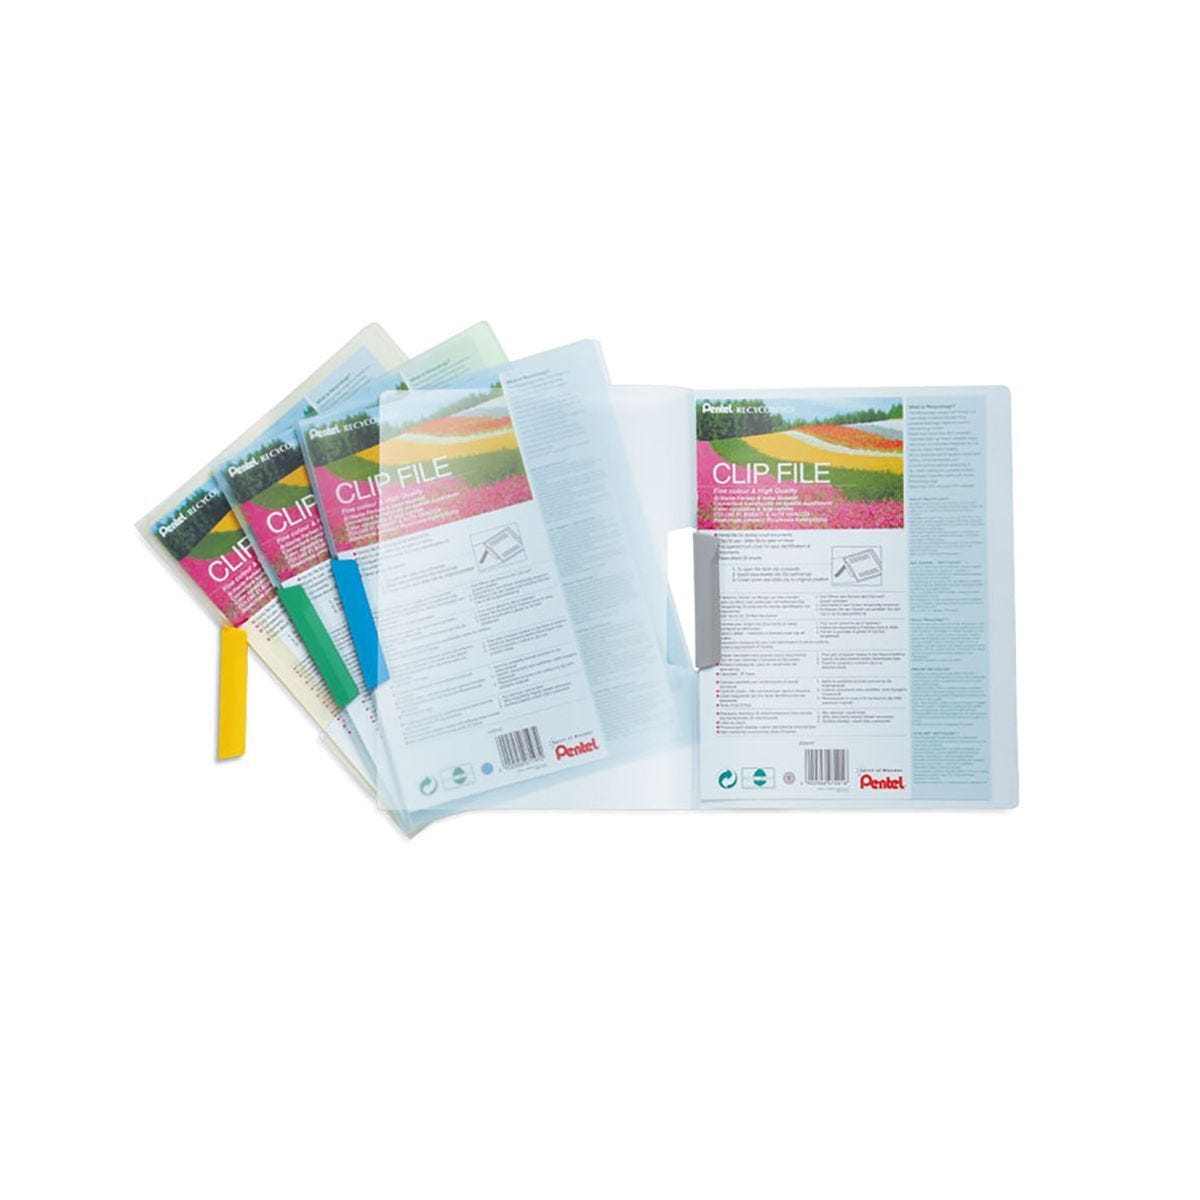 Pentel Clip File A4 Pack of 5